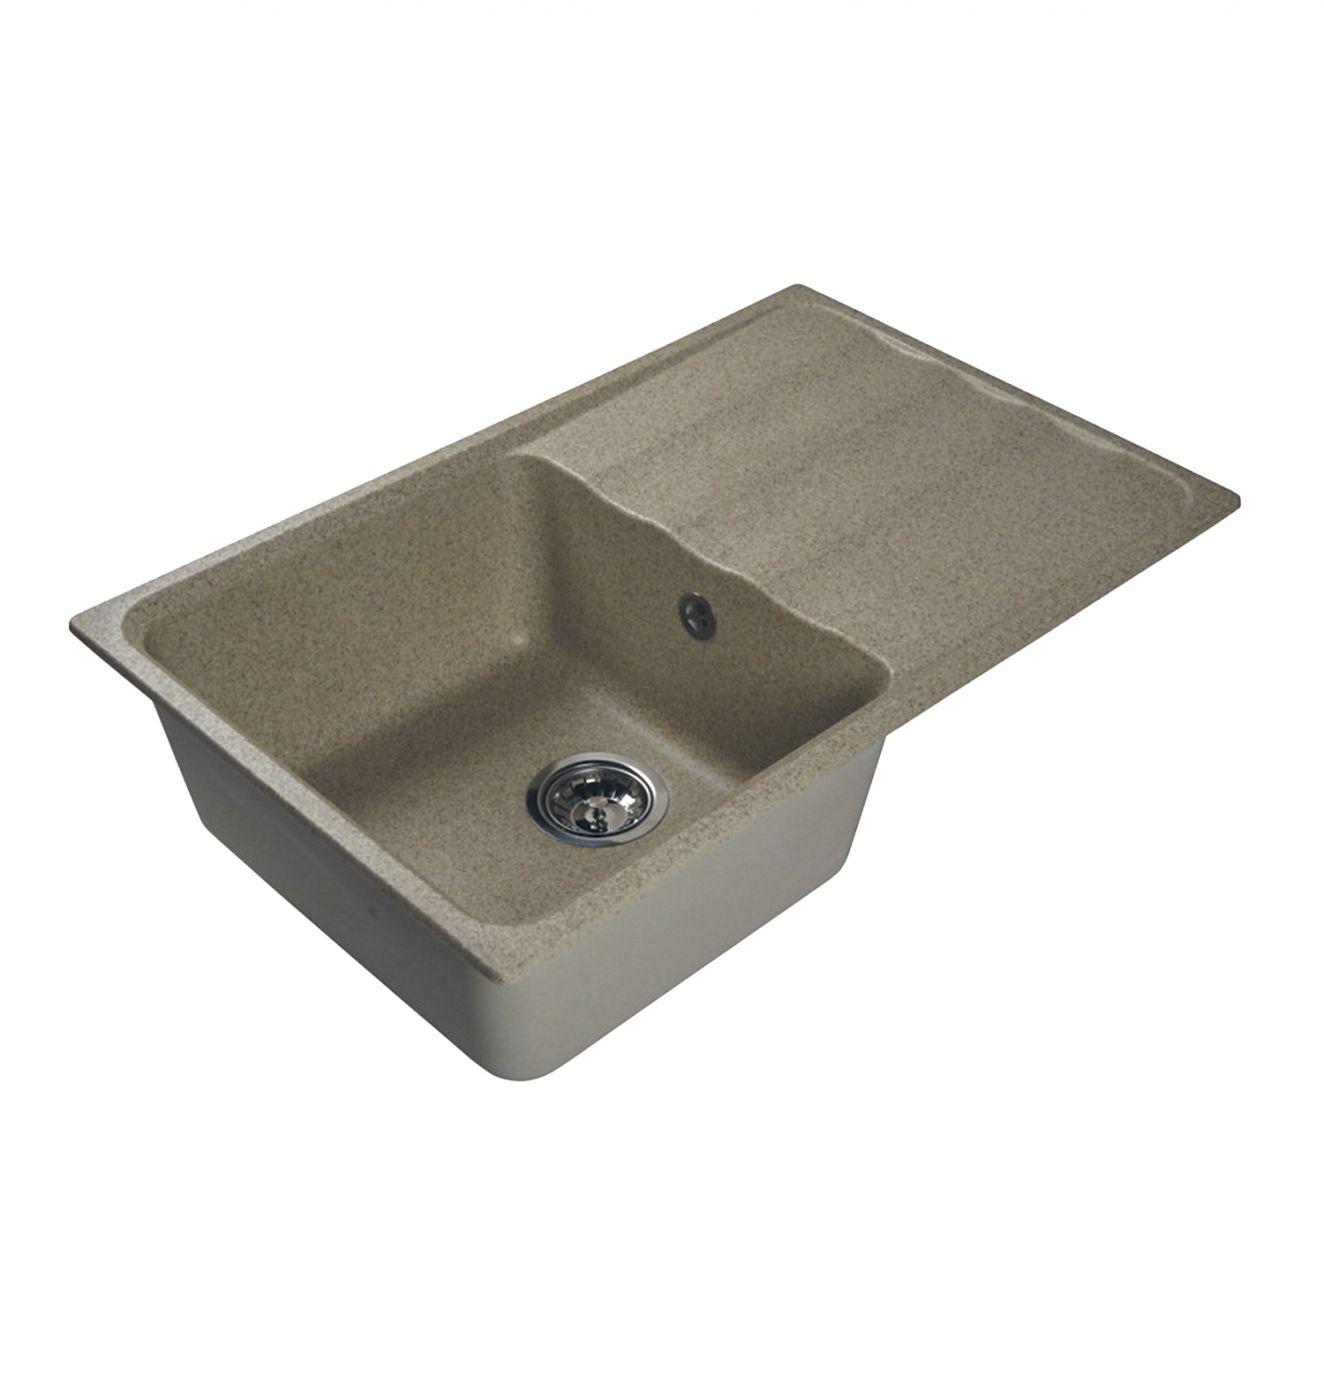 Врезная кухонная мойка LEX Lucerne 780 Sand  78х49см искусственный мрамор RULE000113